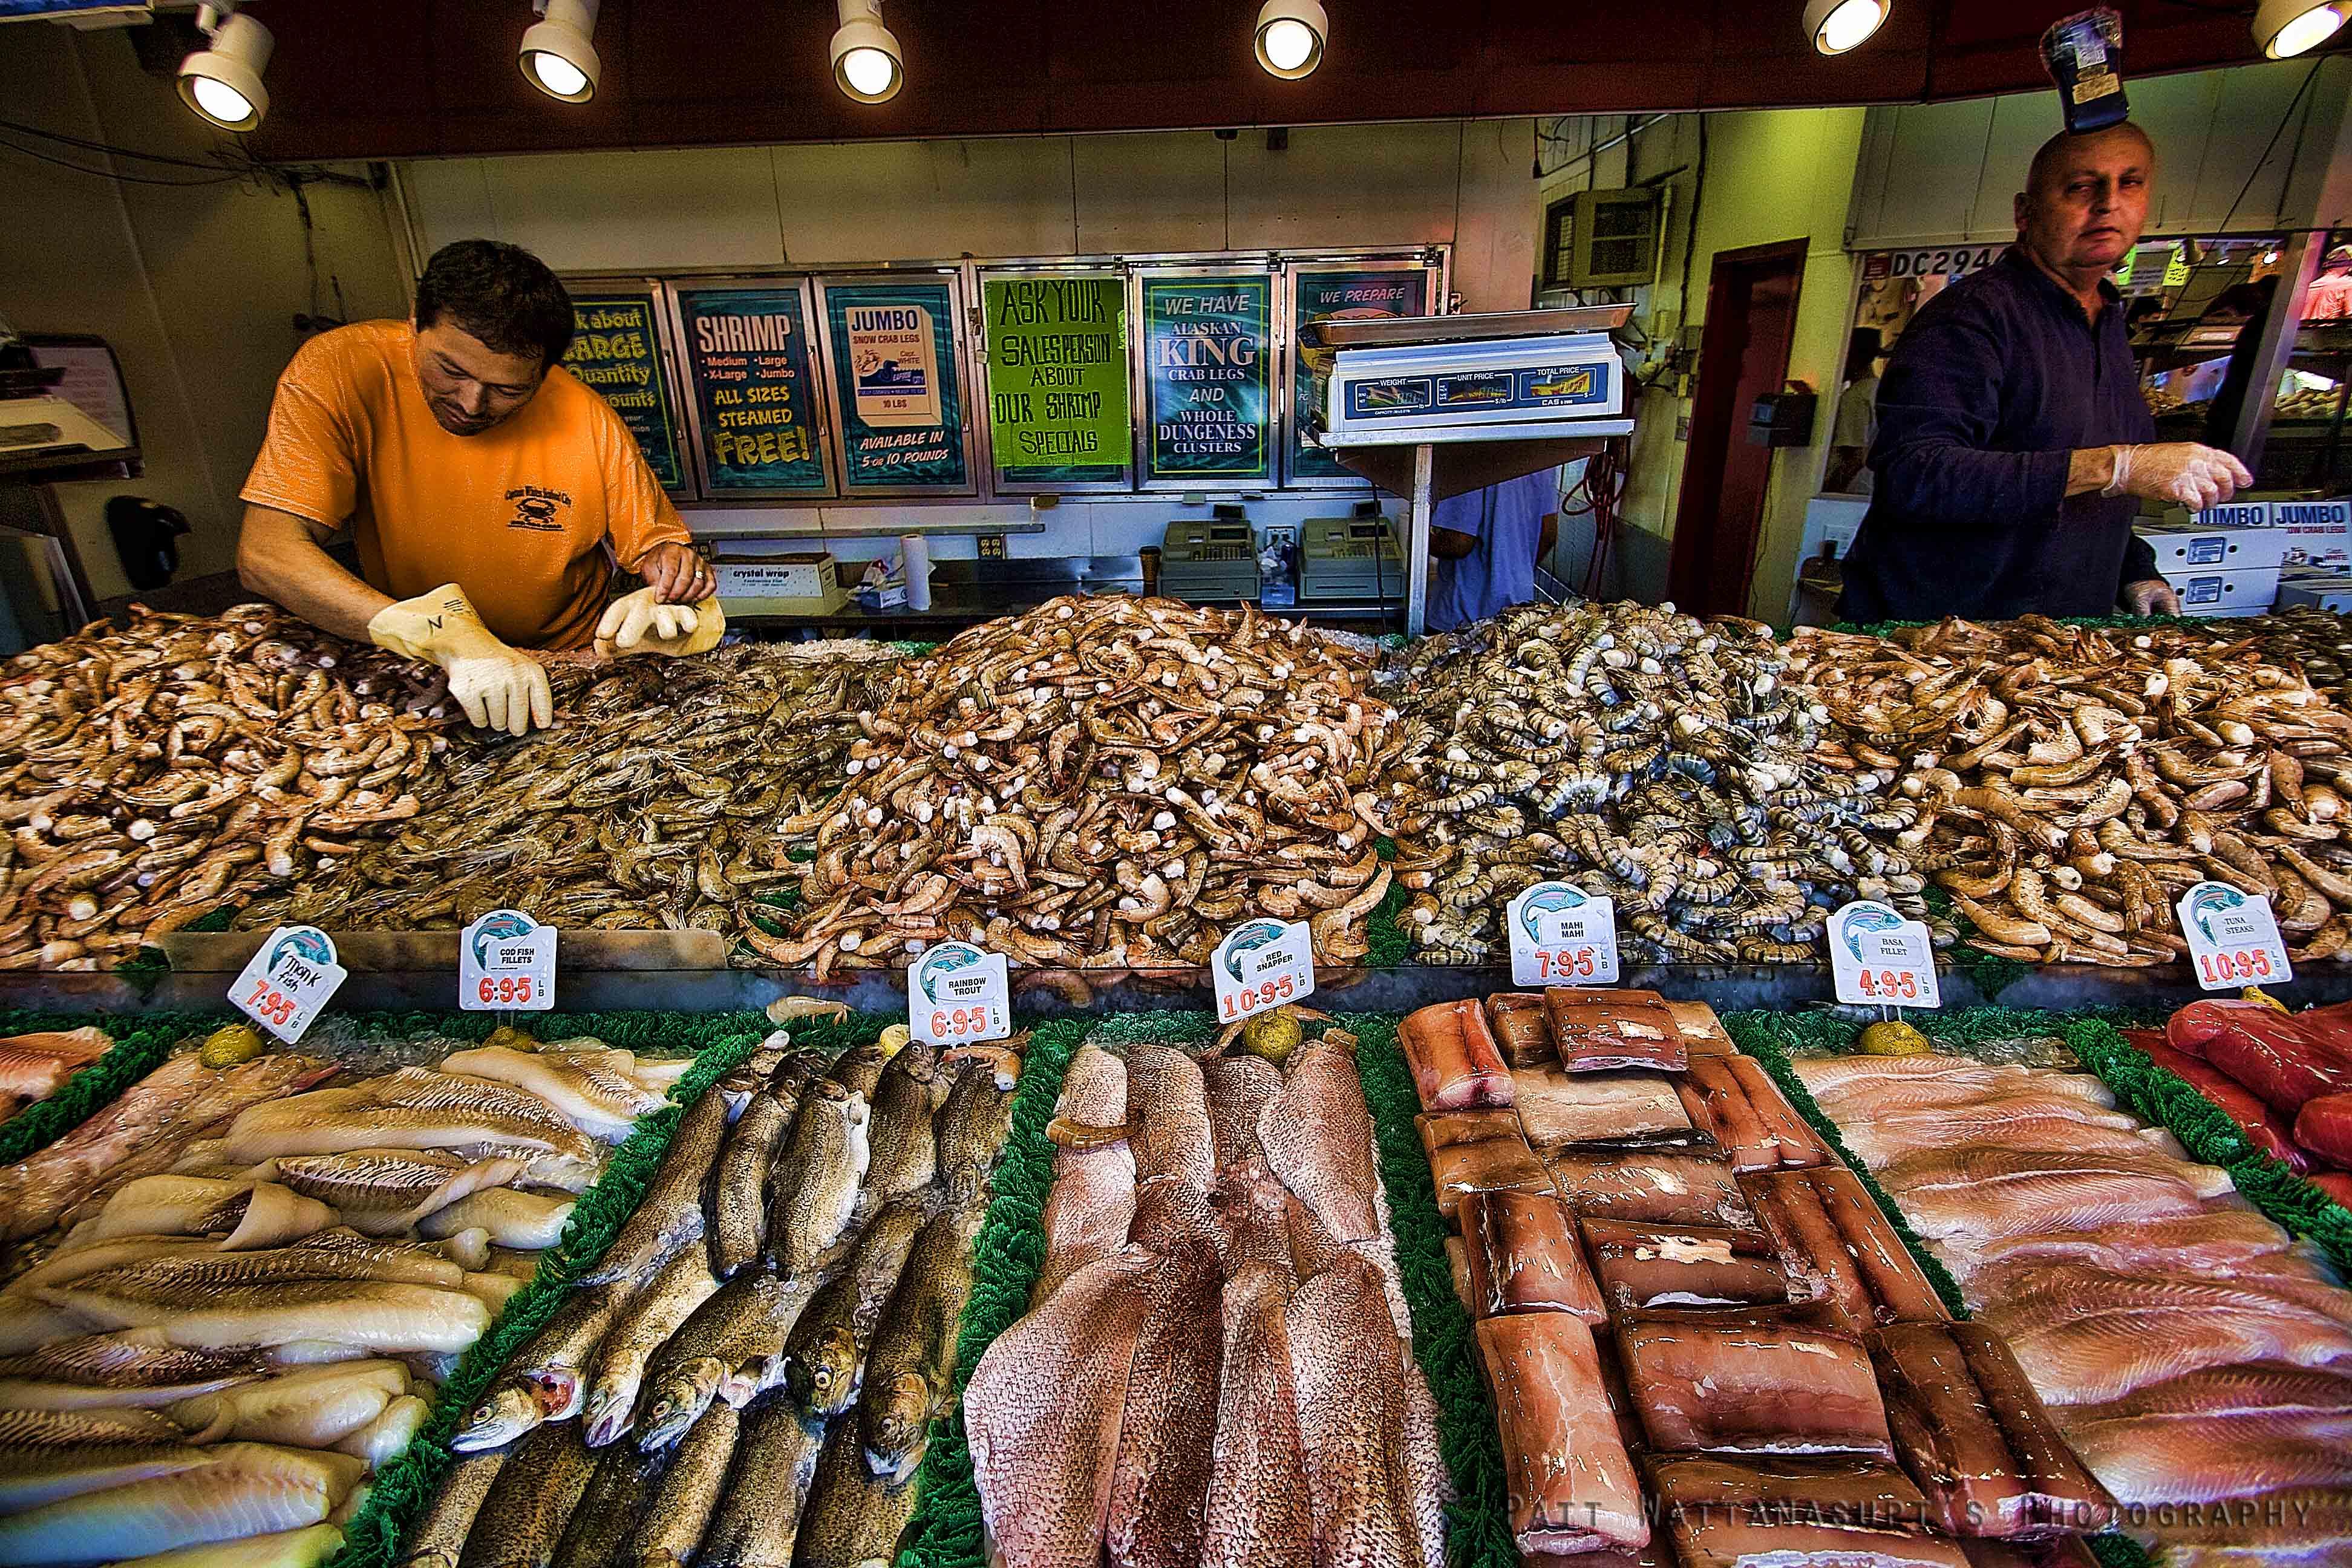 Seafood Vendor at DC Fish Market